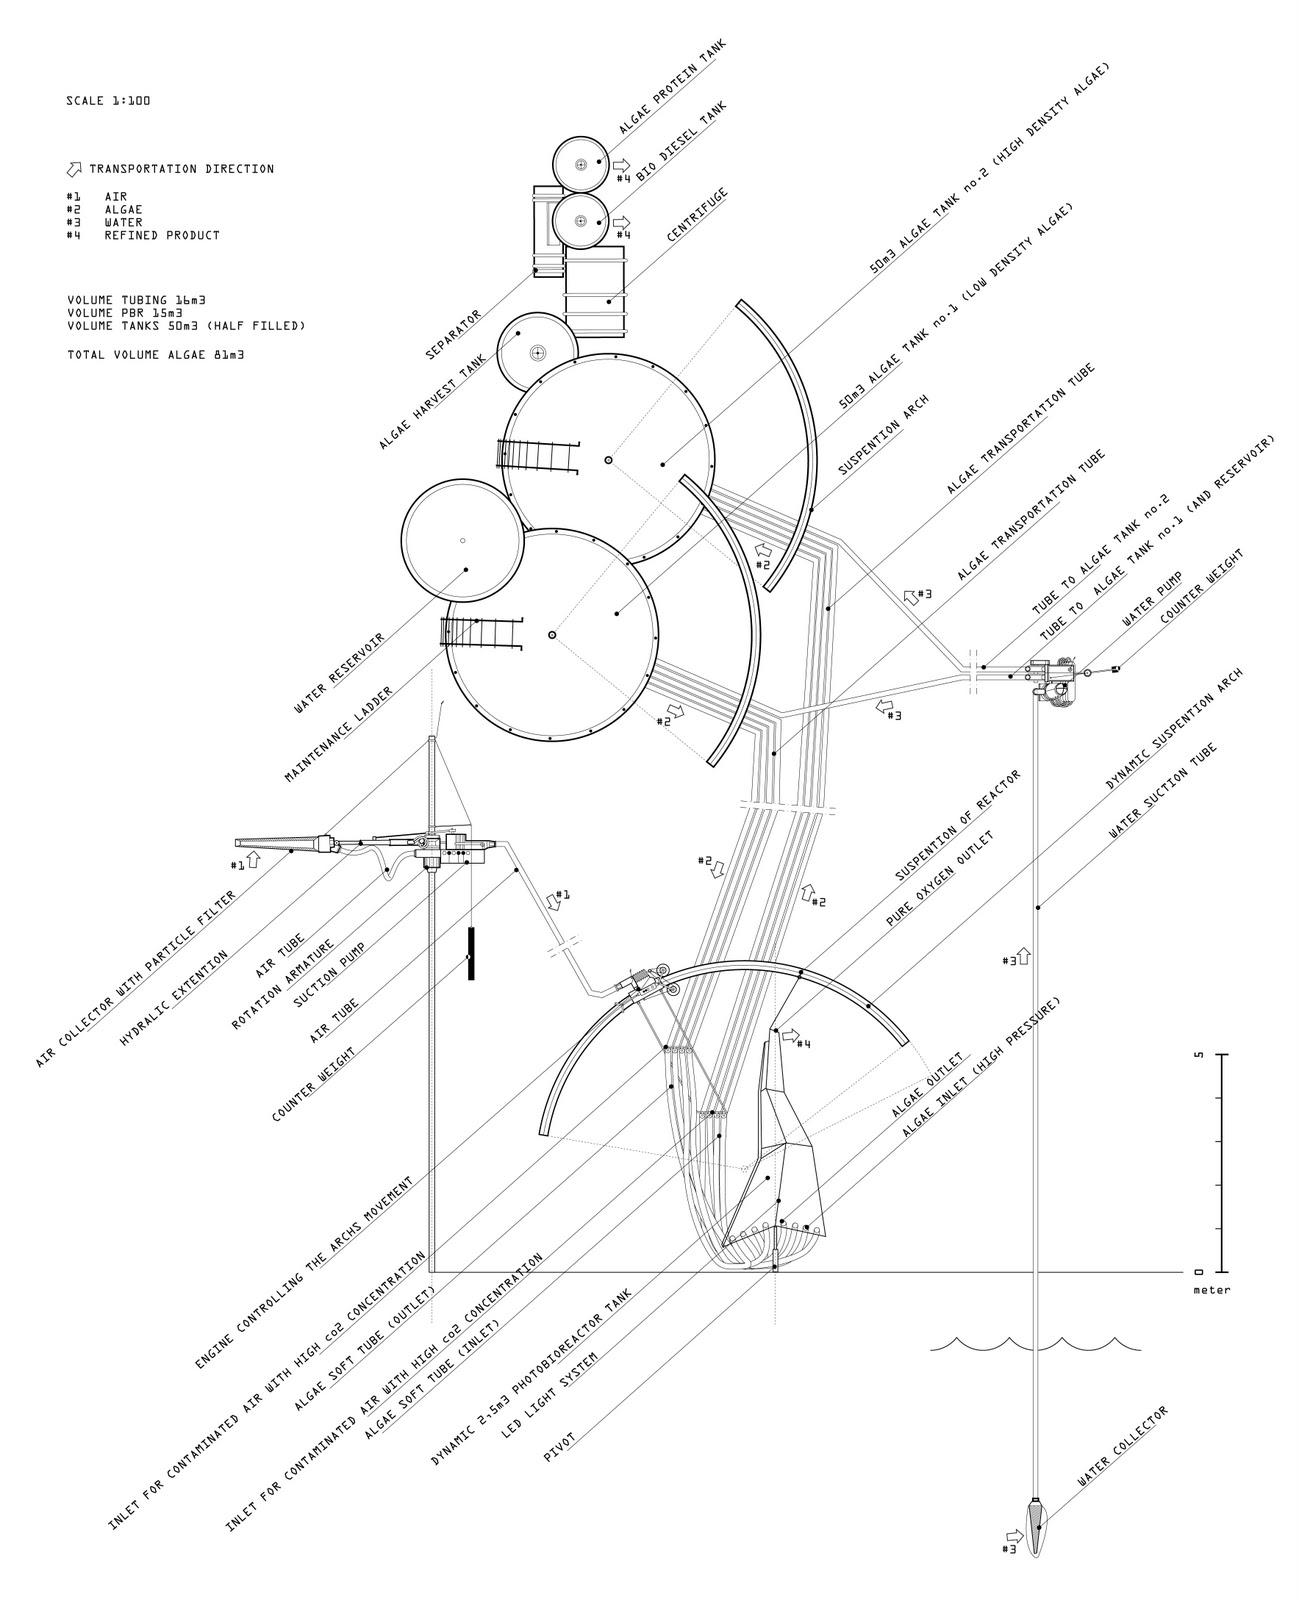 Algae Bioreactor Infrastructural Diagram Mazin Orfali